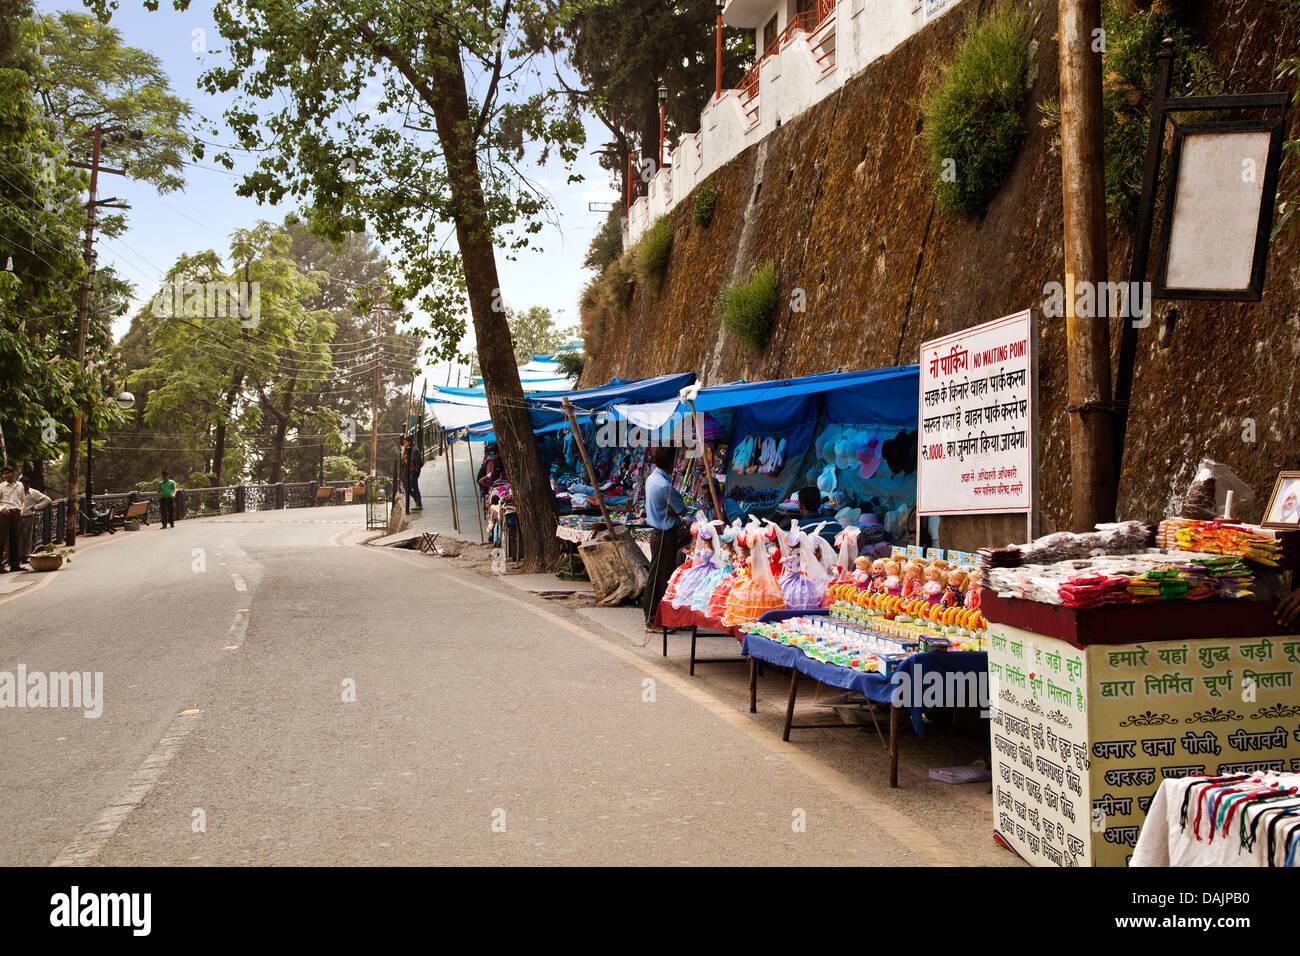 Market stalls at the roadside, Mall Road, Mussoorie, Uttarakhand, India - Stock Image